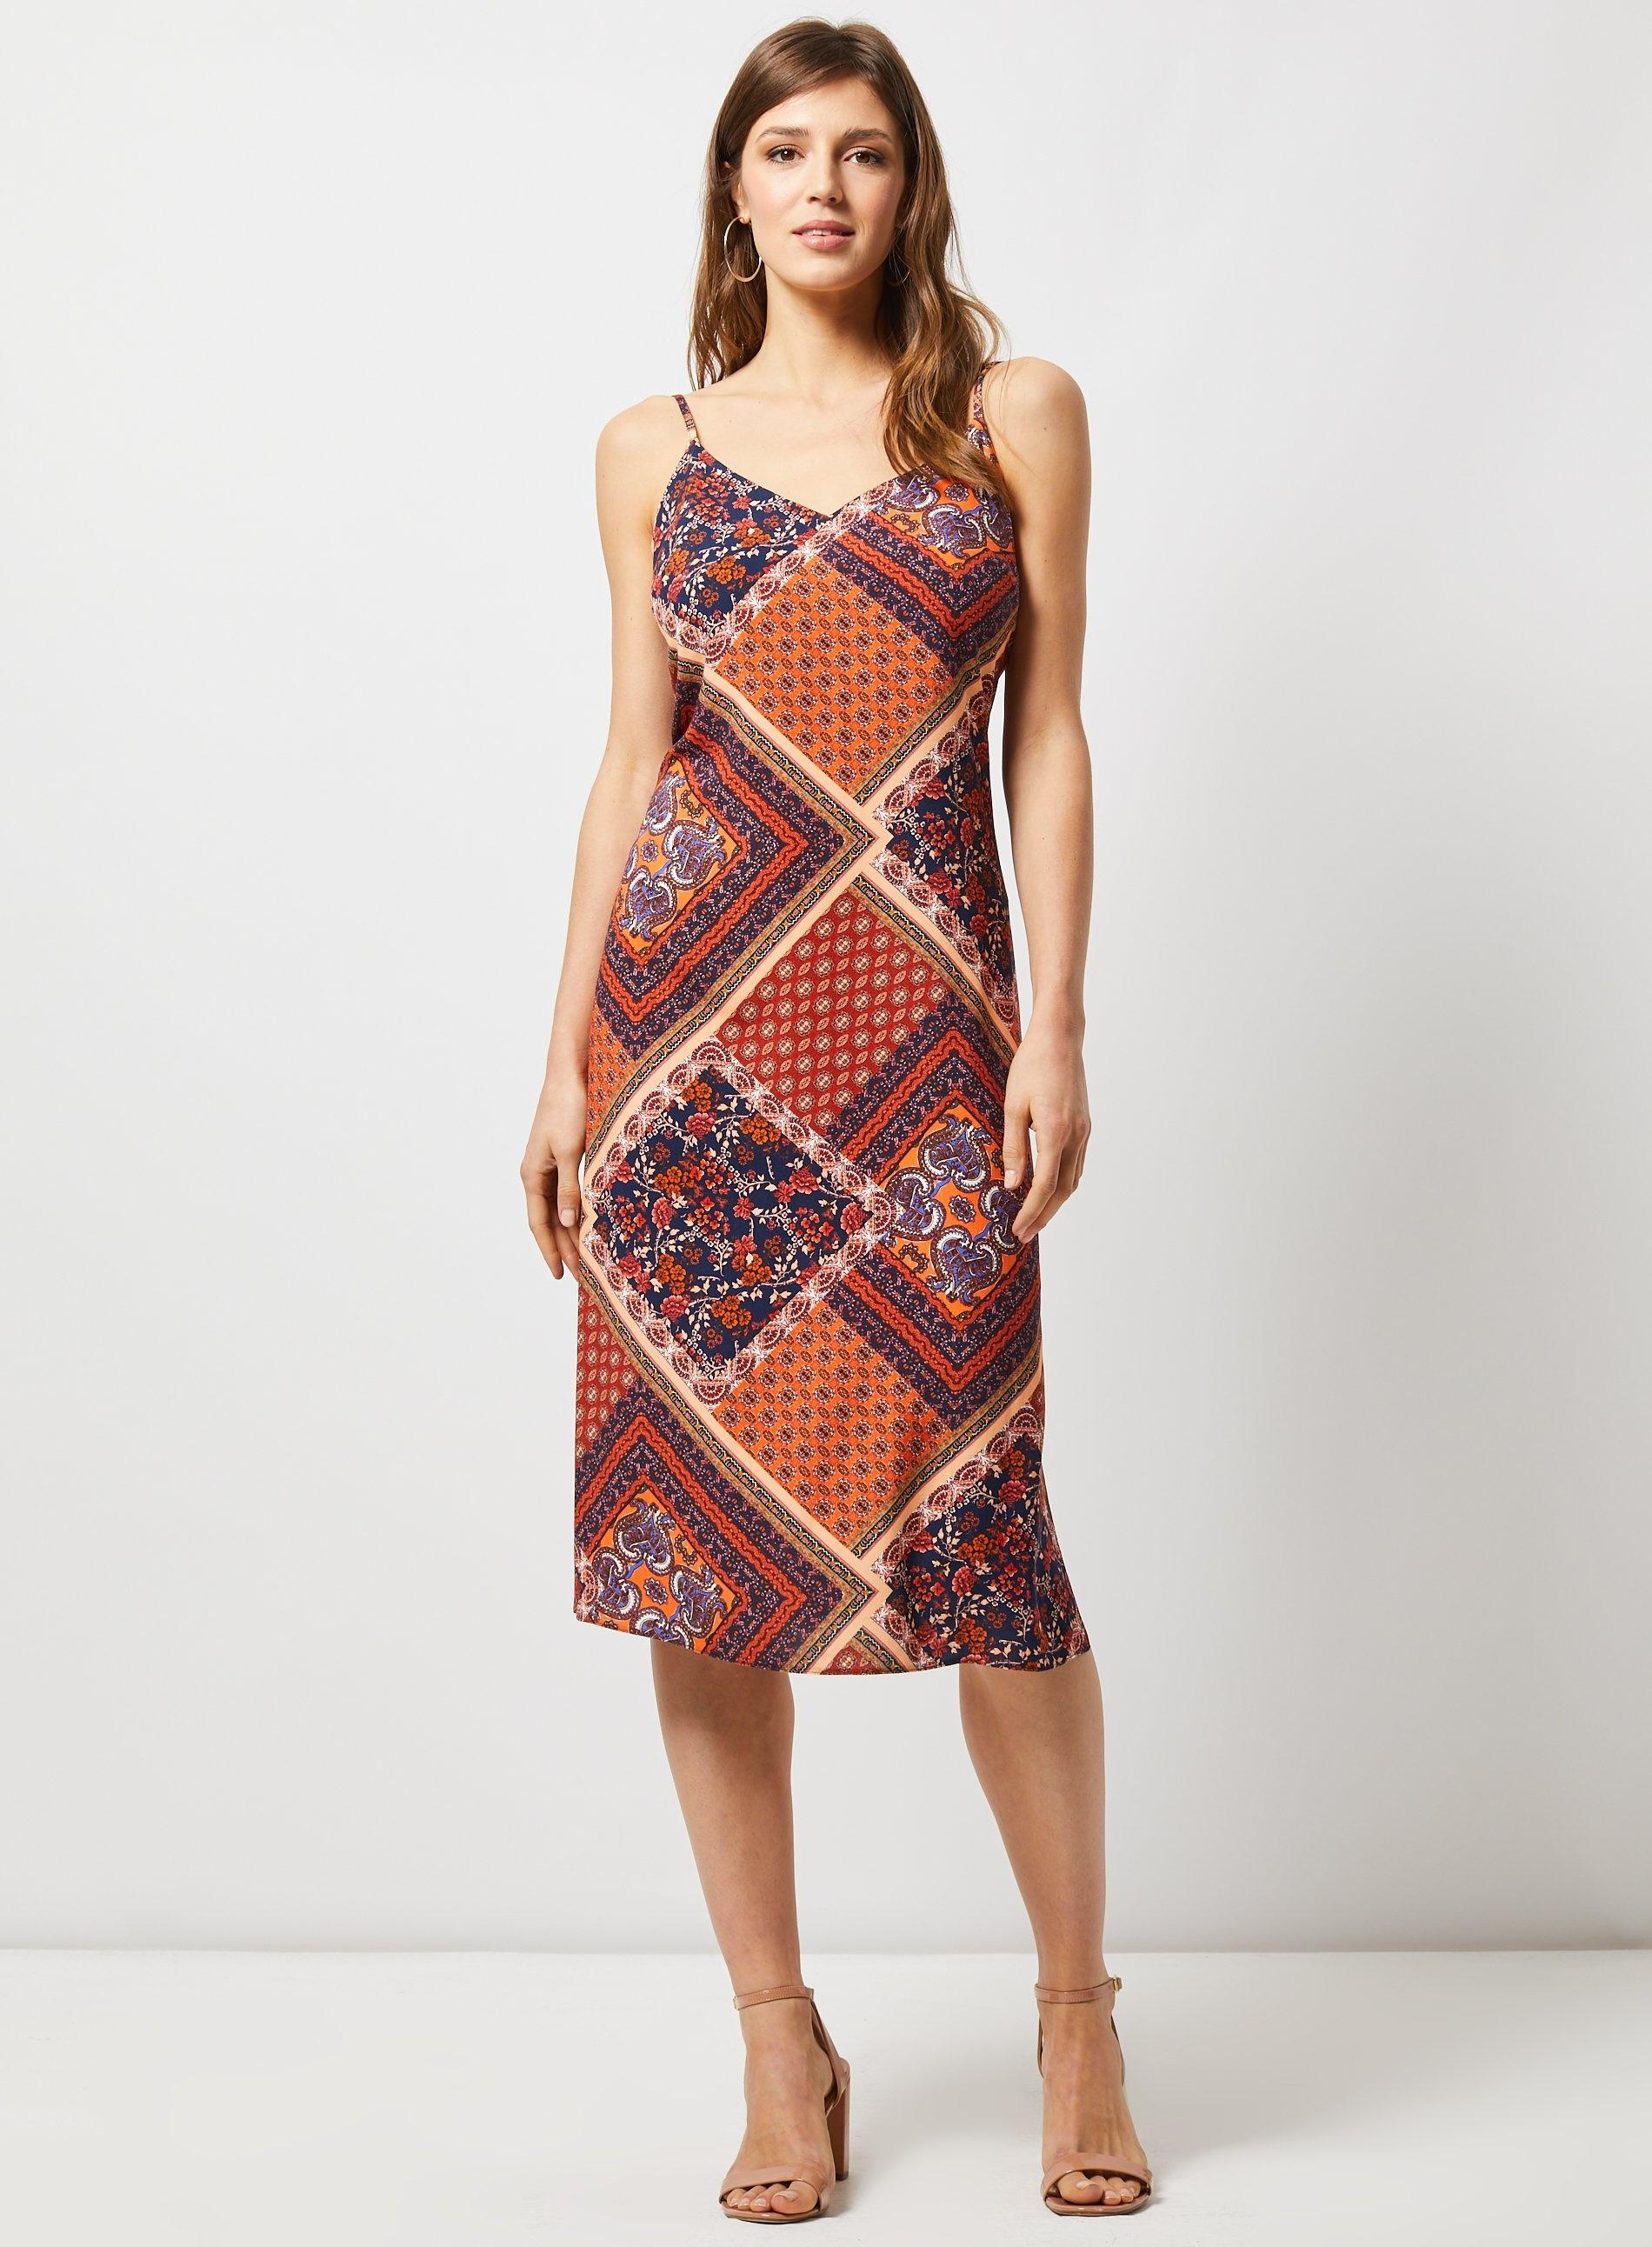 b8970f5f2057b9 Dorothy Perkins - Orange Multi Coloured Scarf Print Slip Dress - Lyst. View  fullscreen